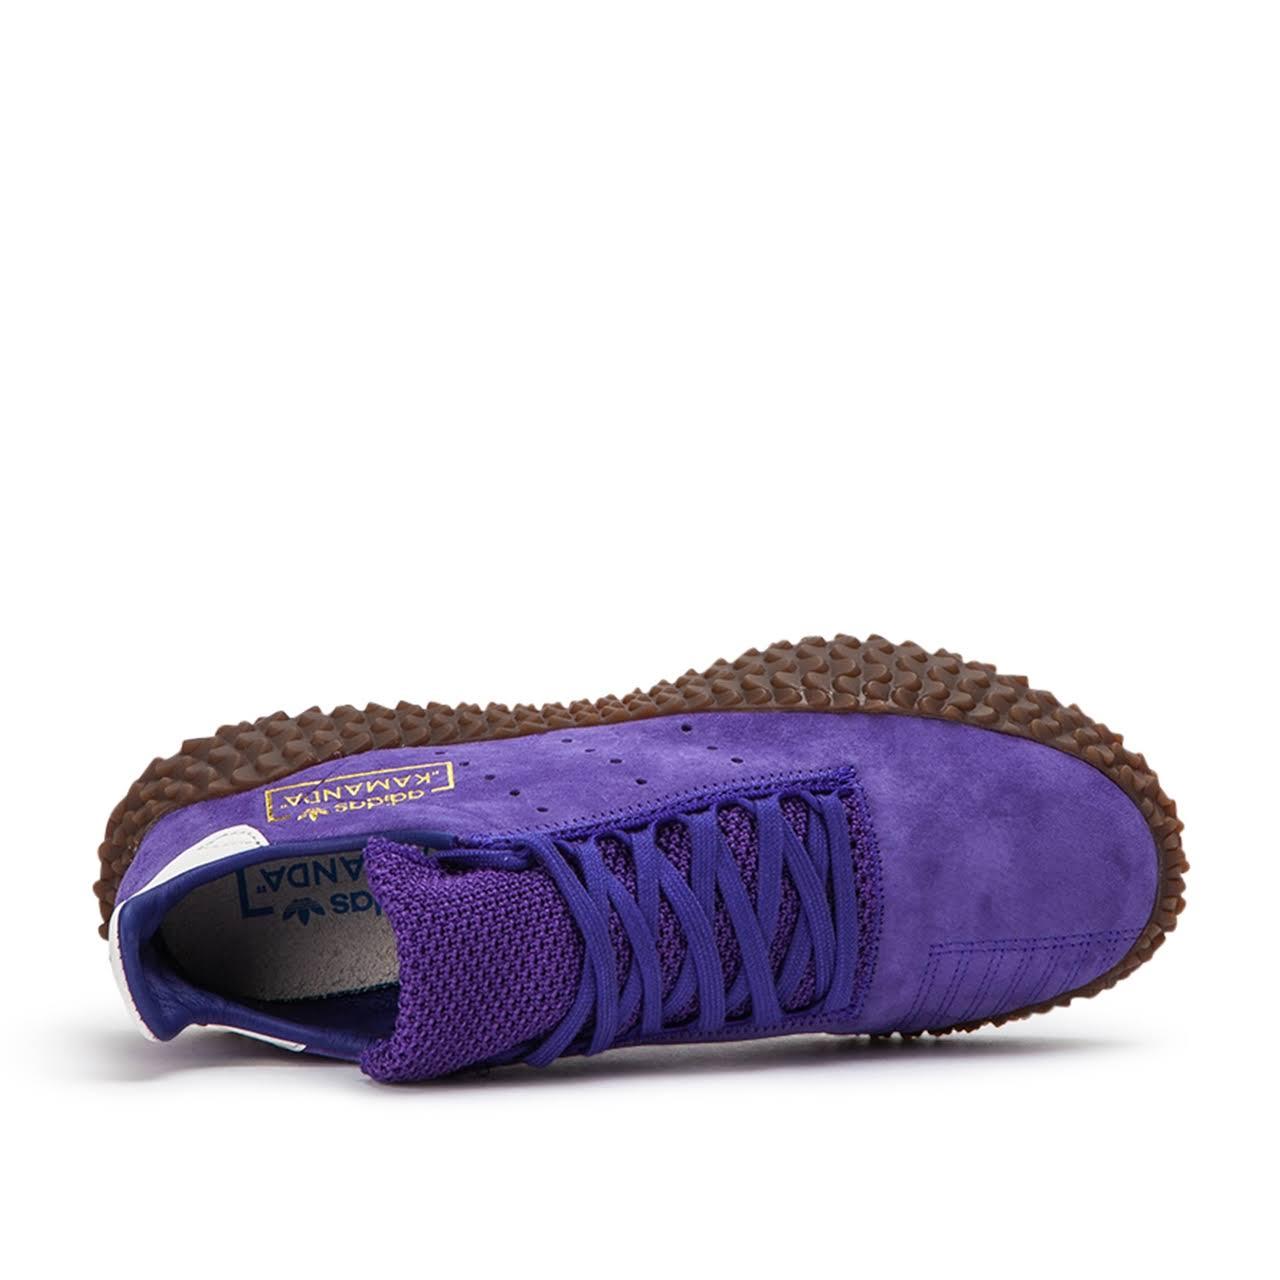 01 Crystal White Purple Kamanda Ink amp; Adidas SA5TwxIqw